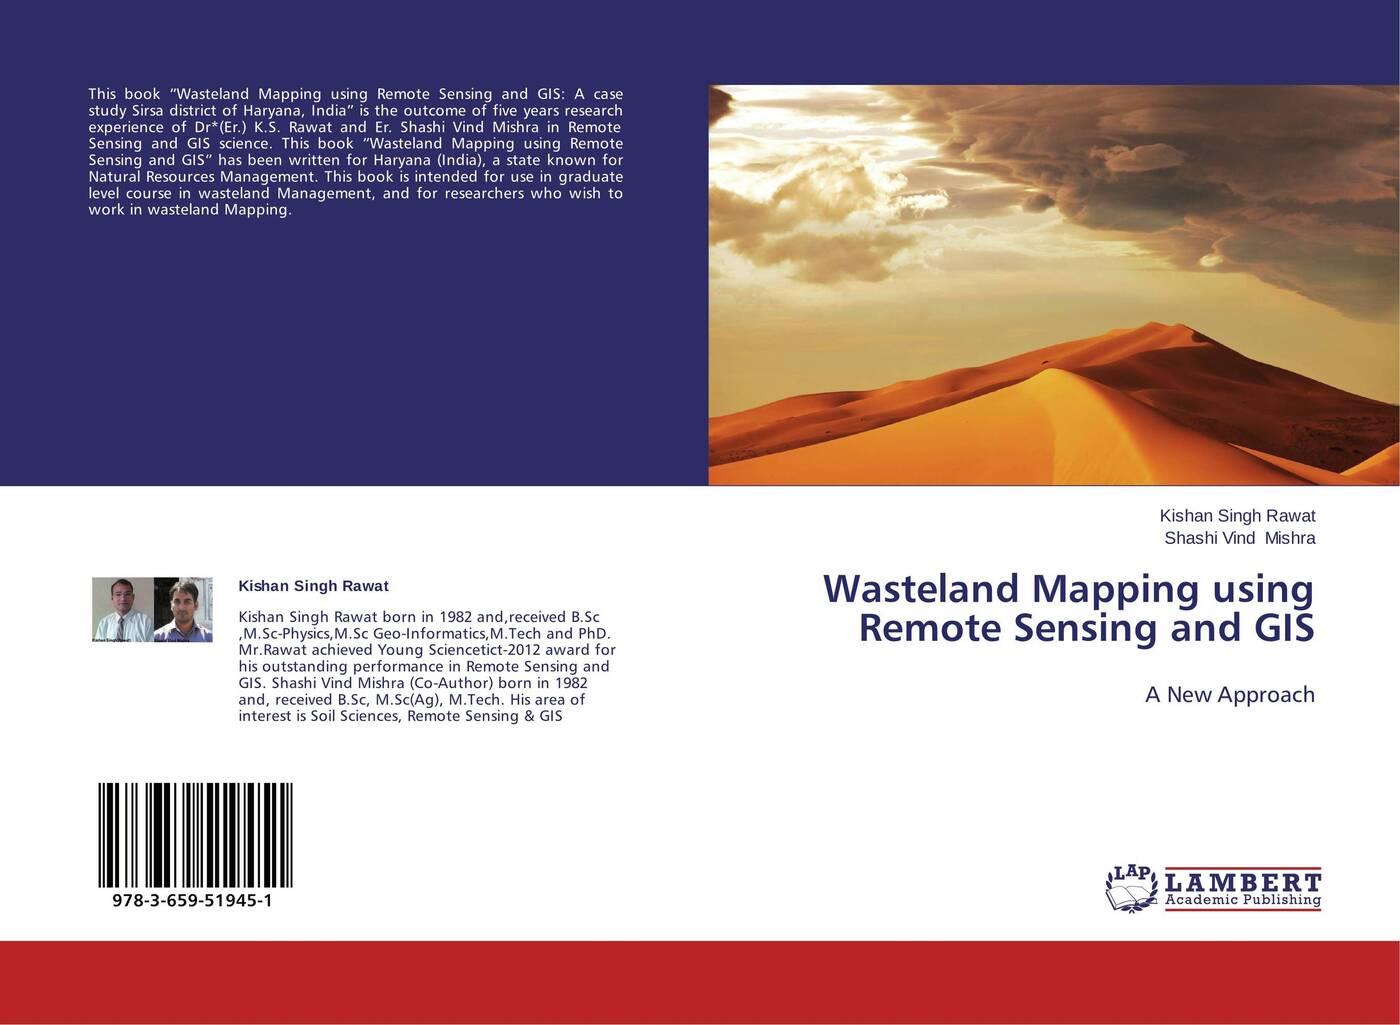 Kishan Singh Rawat and Shashi Vind Mishra Wasteland Mapping using Remote Sensing and GIS klemas victor v remote sensing and global environmental change